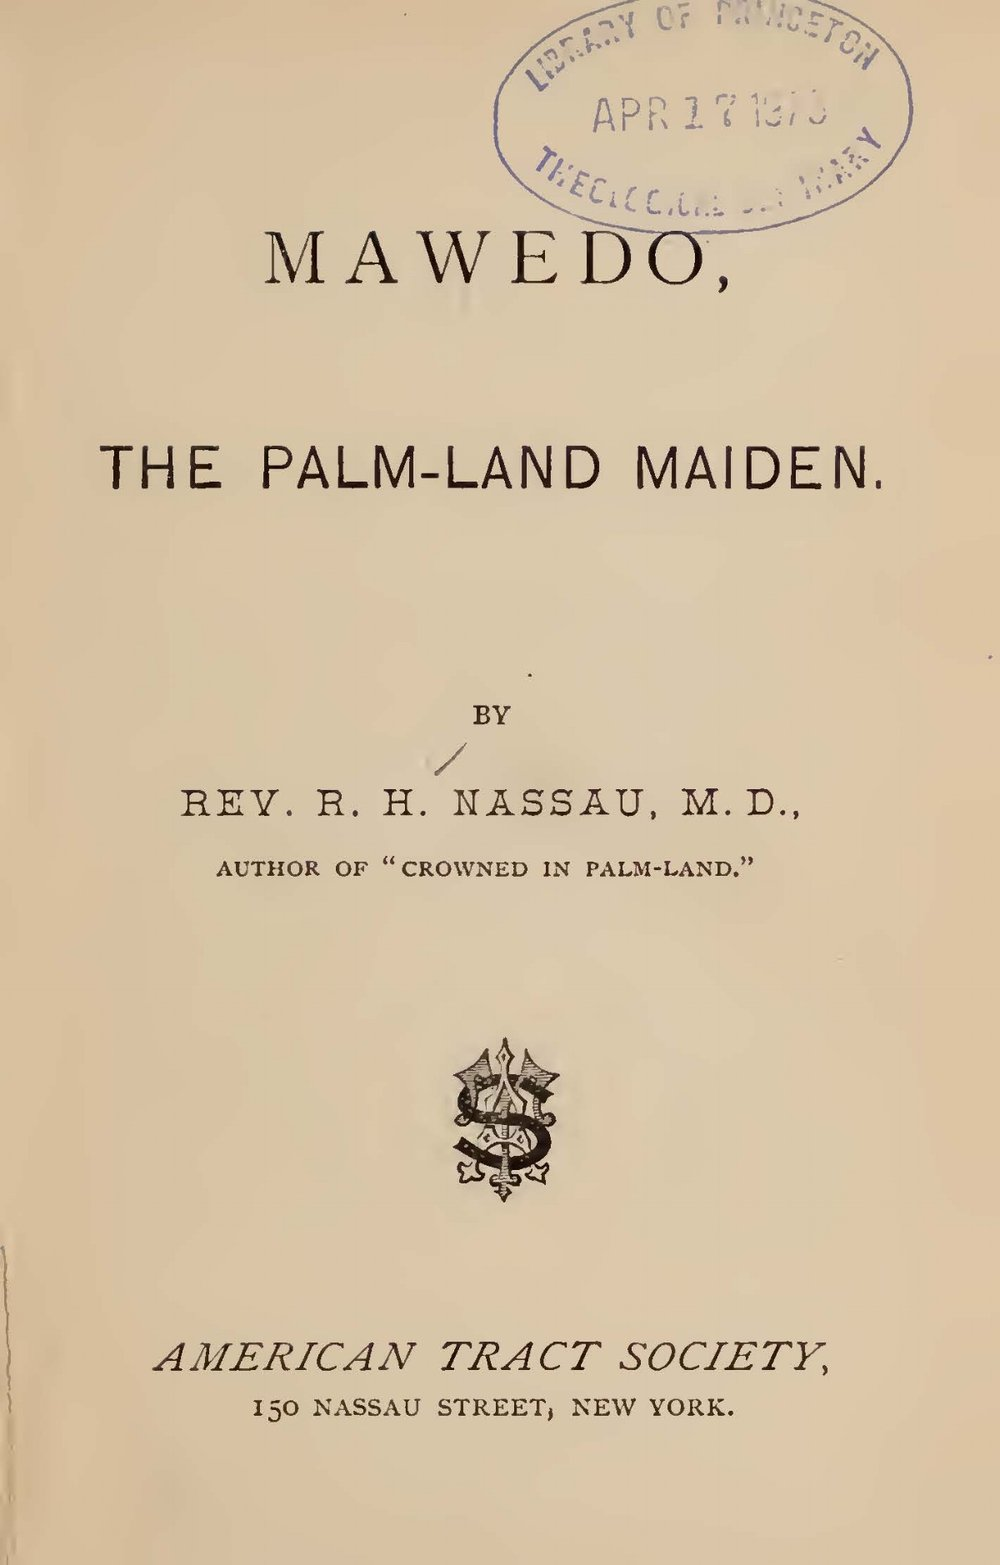 Nassau, Robert Hamill, Mawedo the Palm-Land Maiden Title Page.jpg